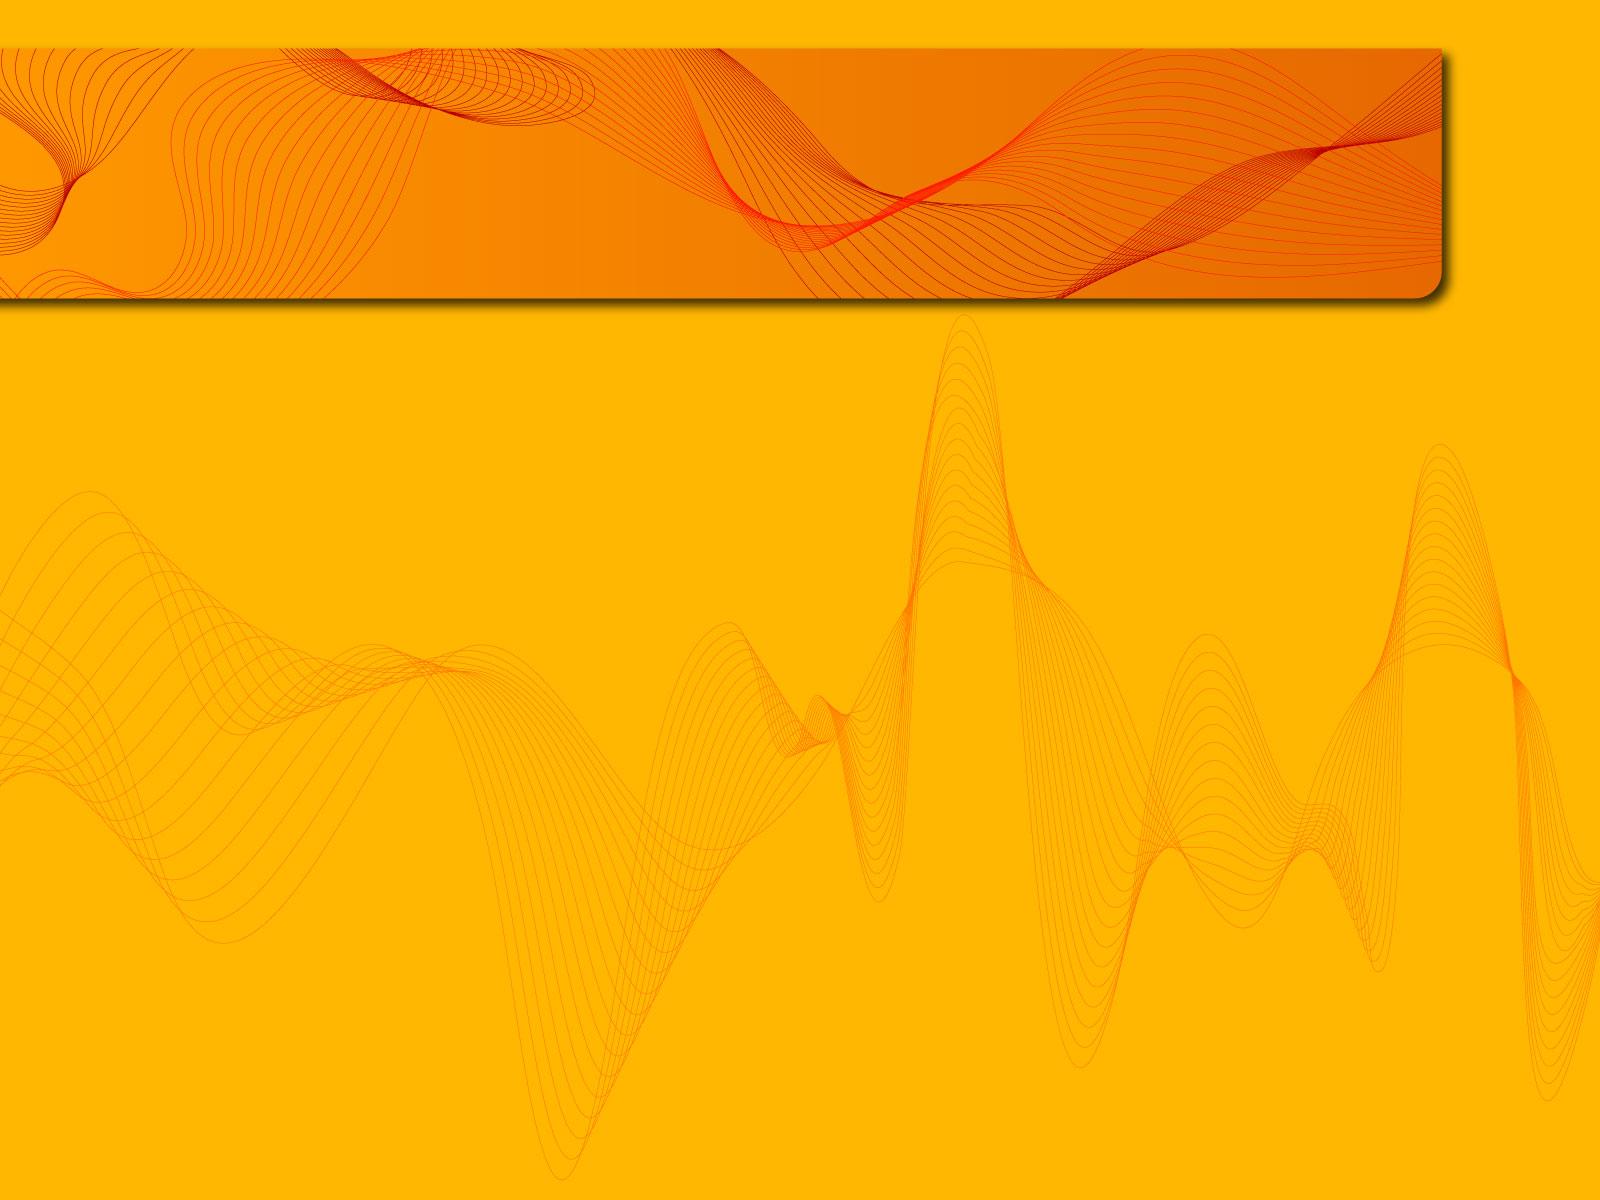 41+] Clip Art Wallpaper Backgrounds on WallpaperSafari.